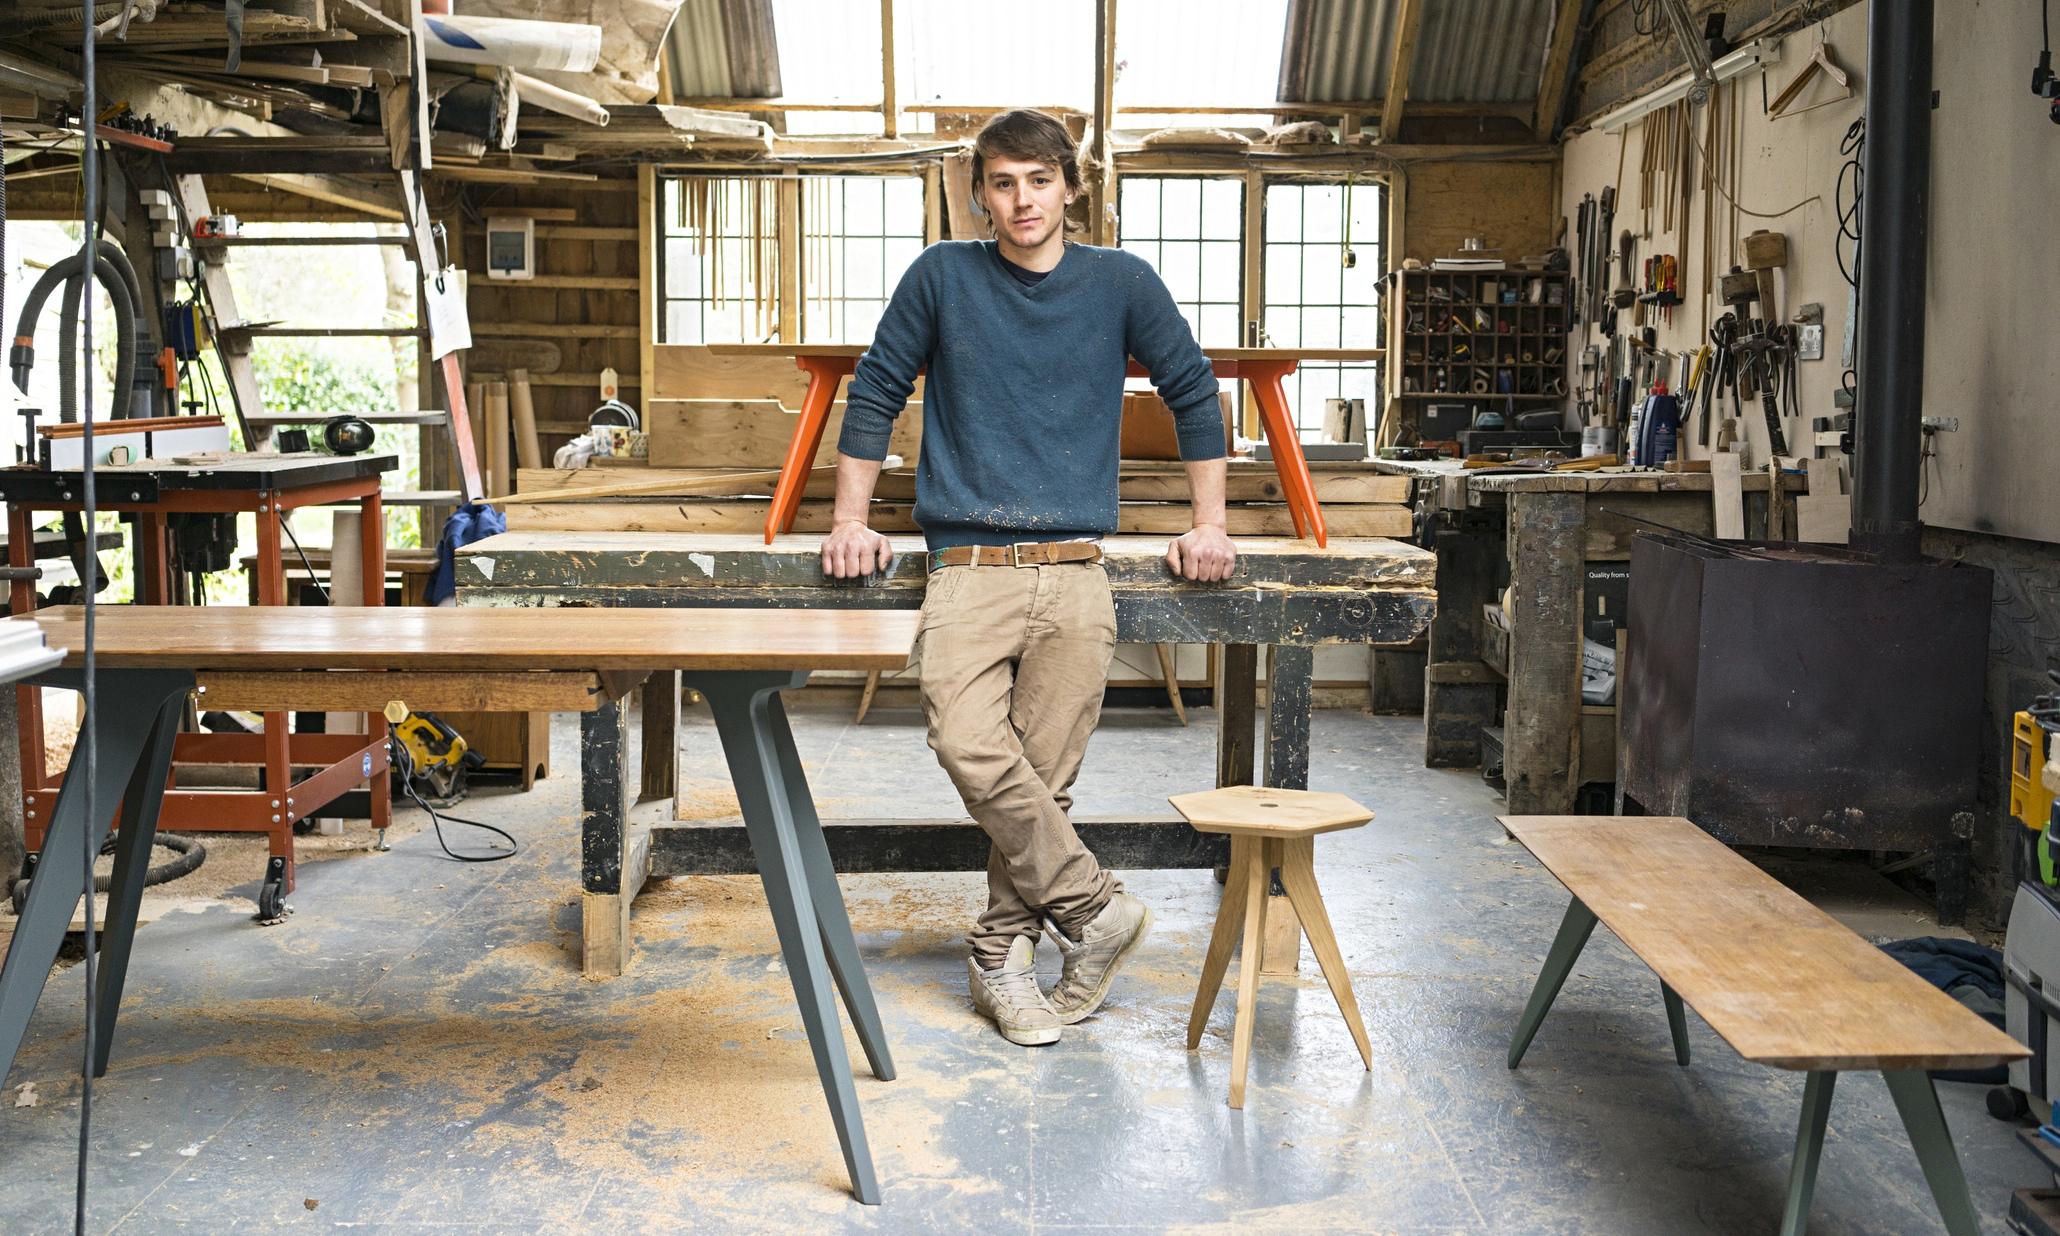 Brilliant Get Woodworking Week 2013 Wednesday  Tom39s Workbench